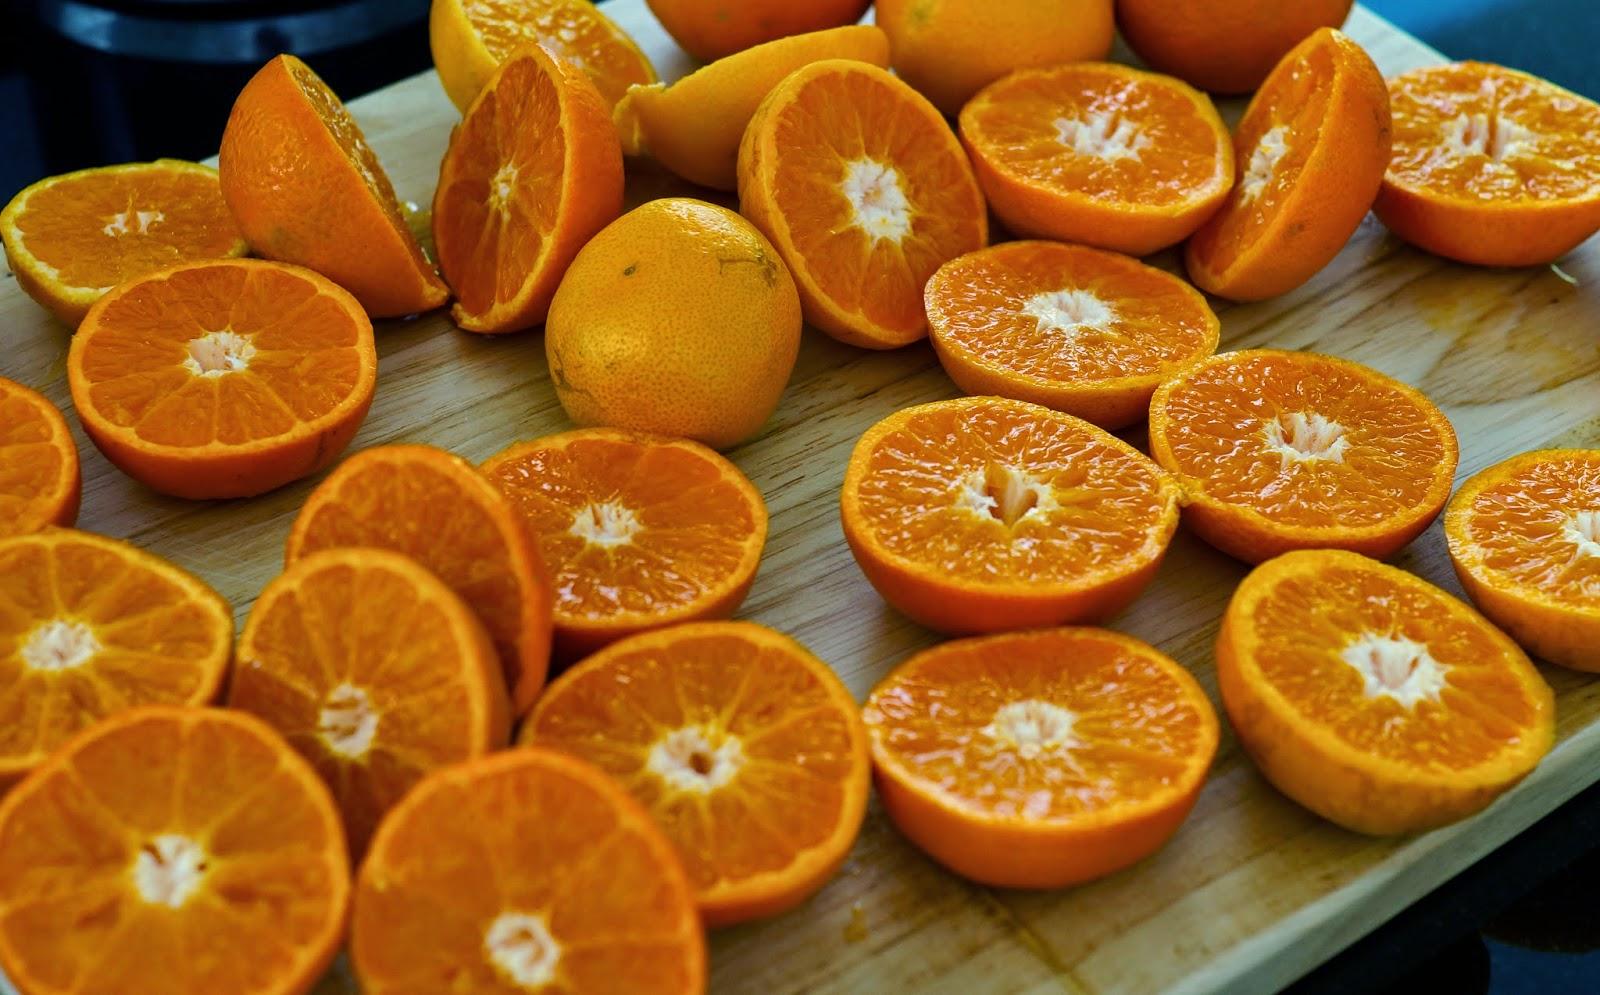 freshly squeezed orange